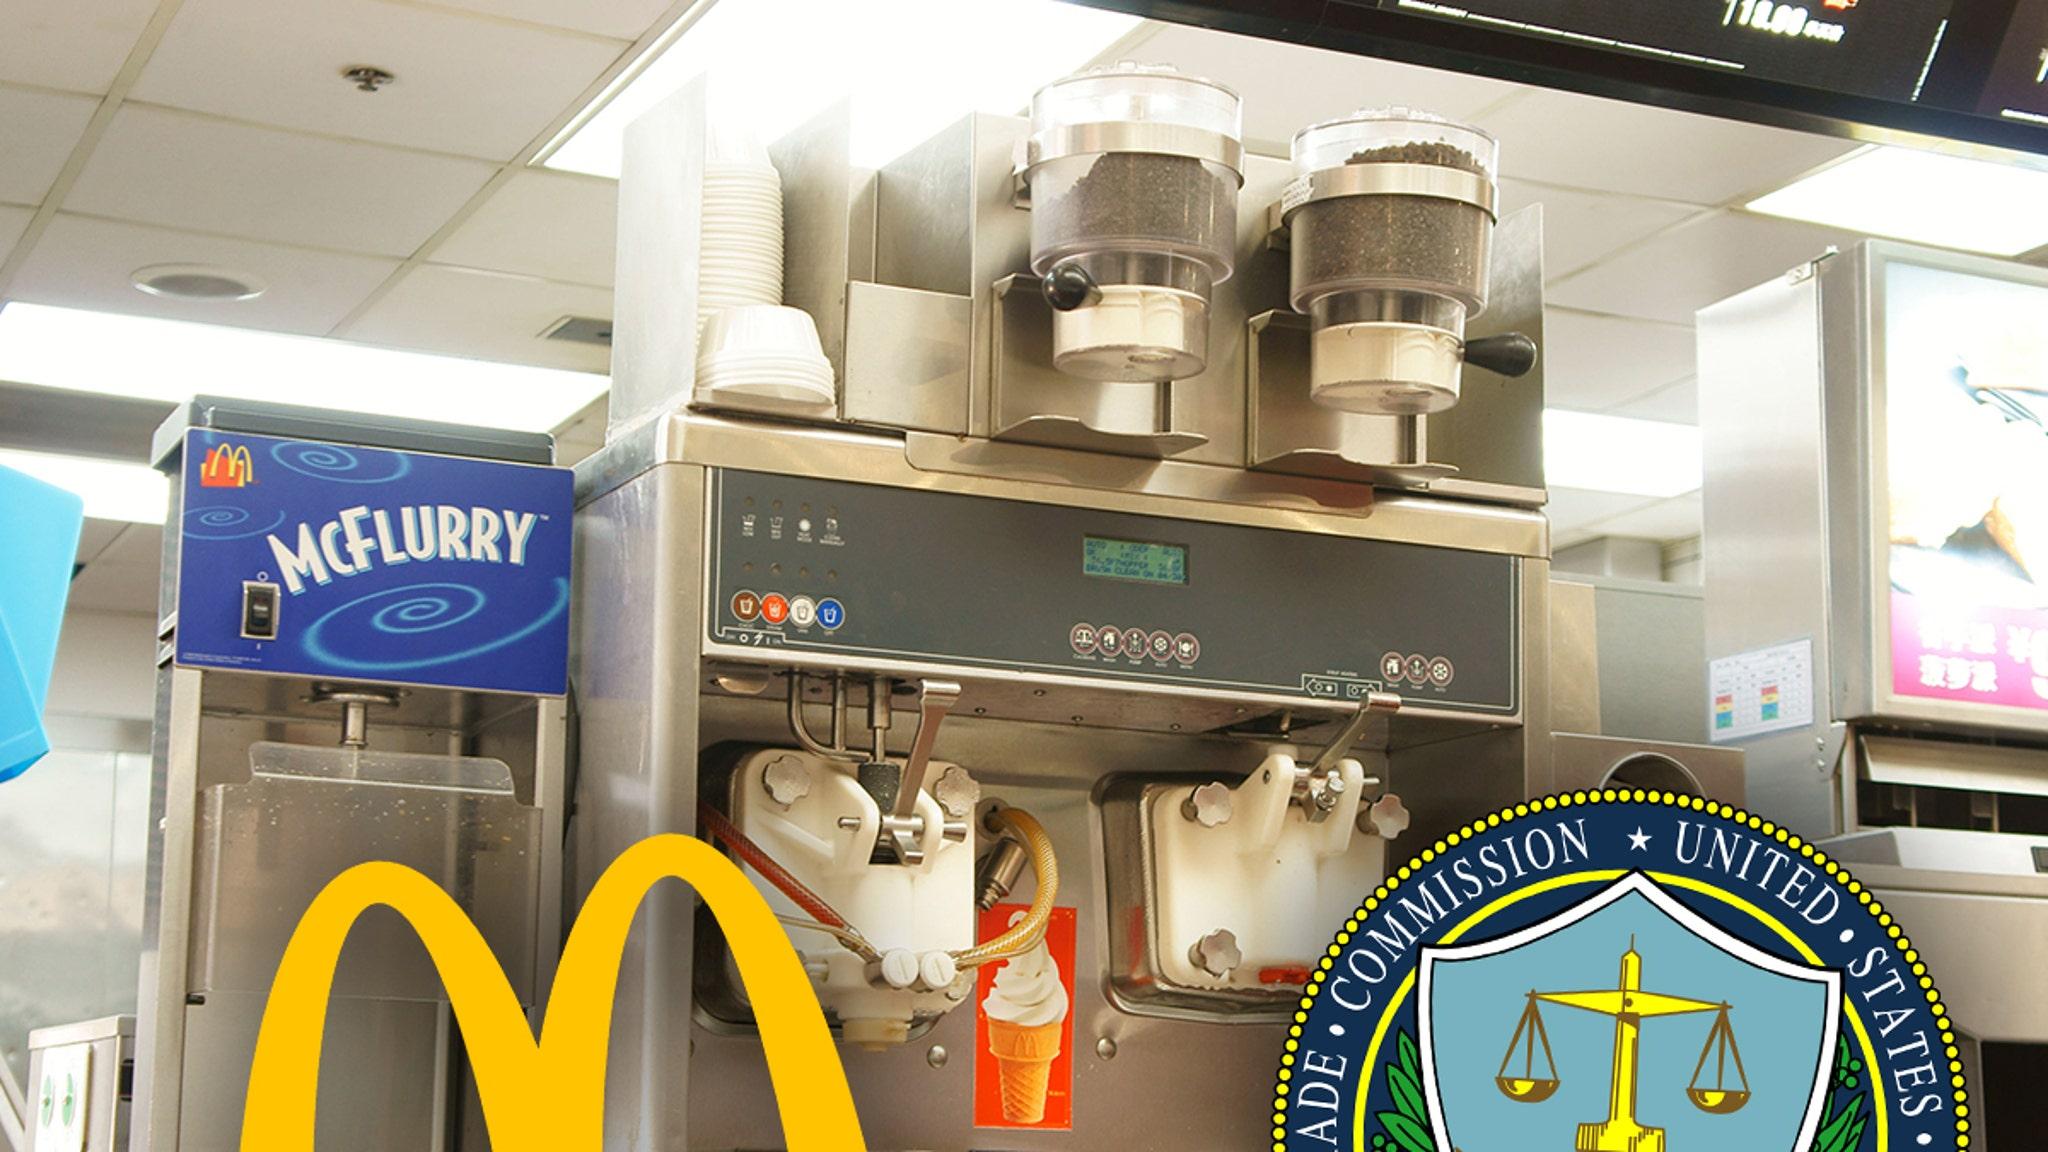 McDonalds' Always-Broken McFlurry Machines Get FTC's Attention